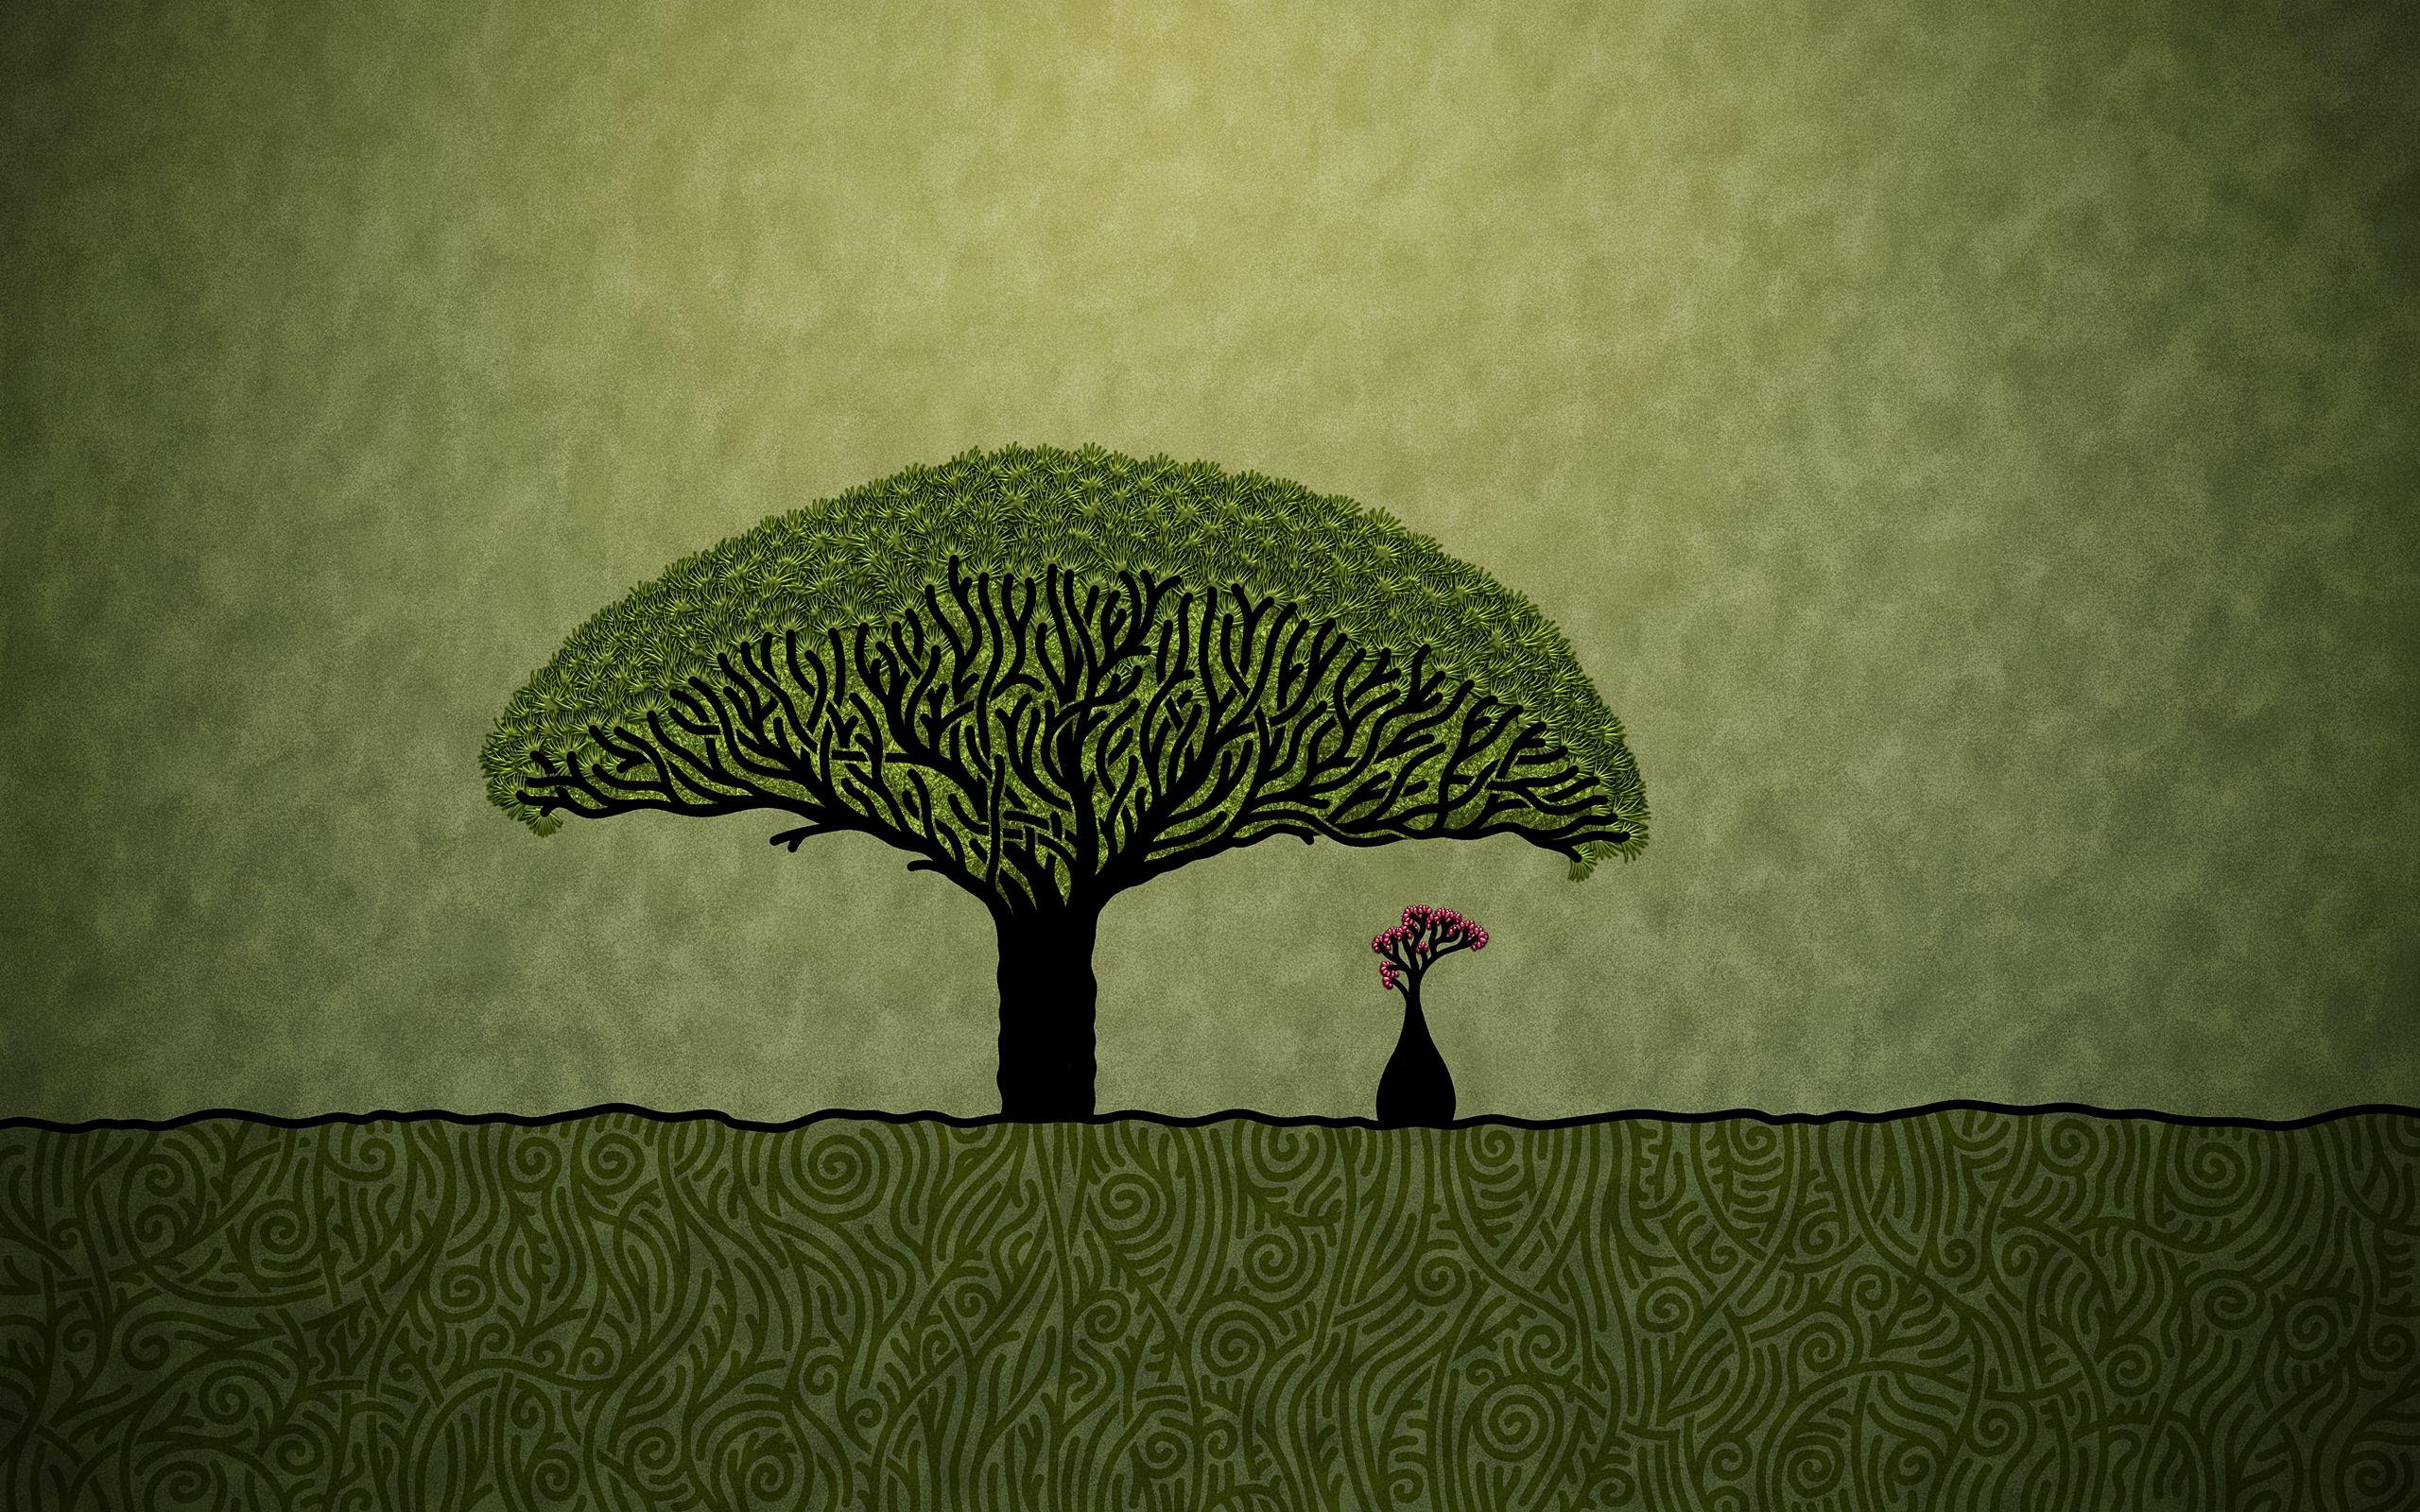 hd wallpaper tree